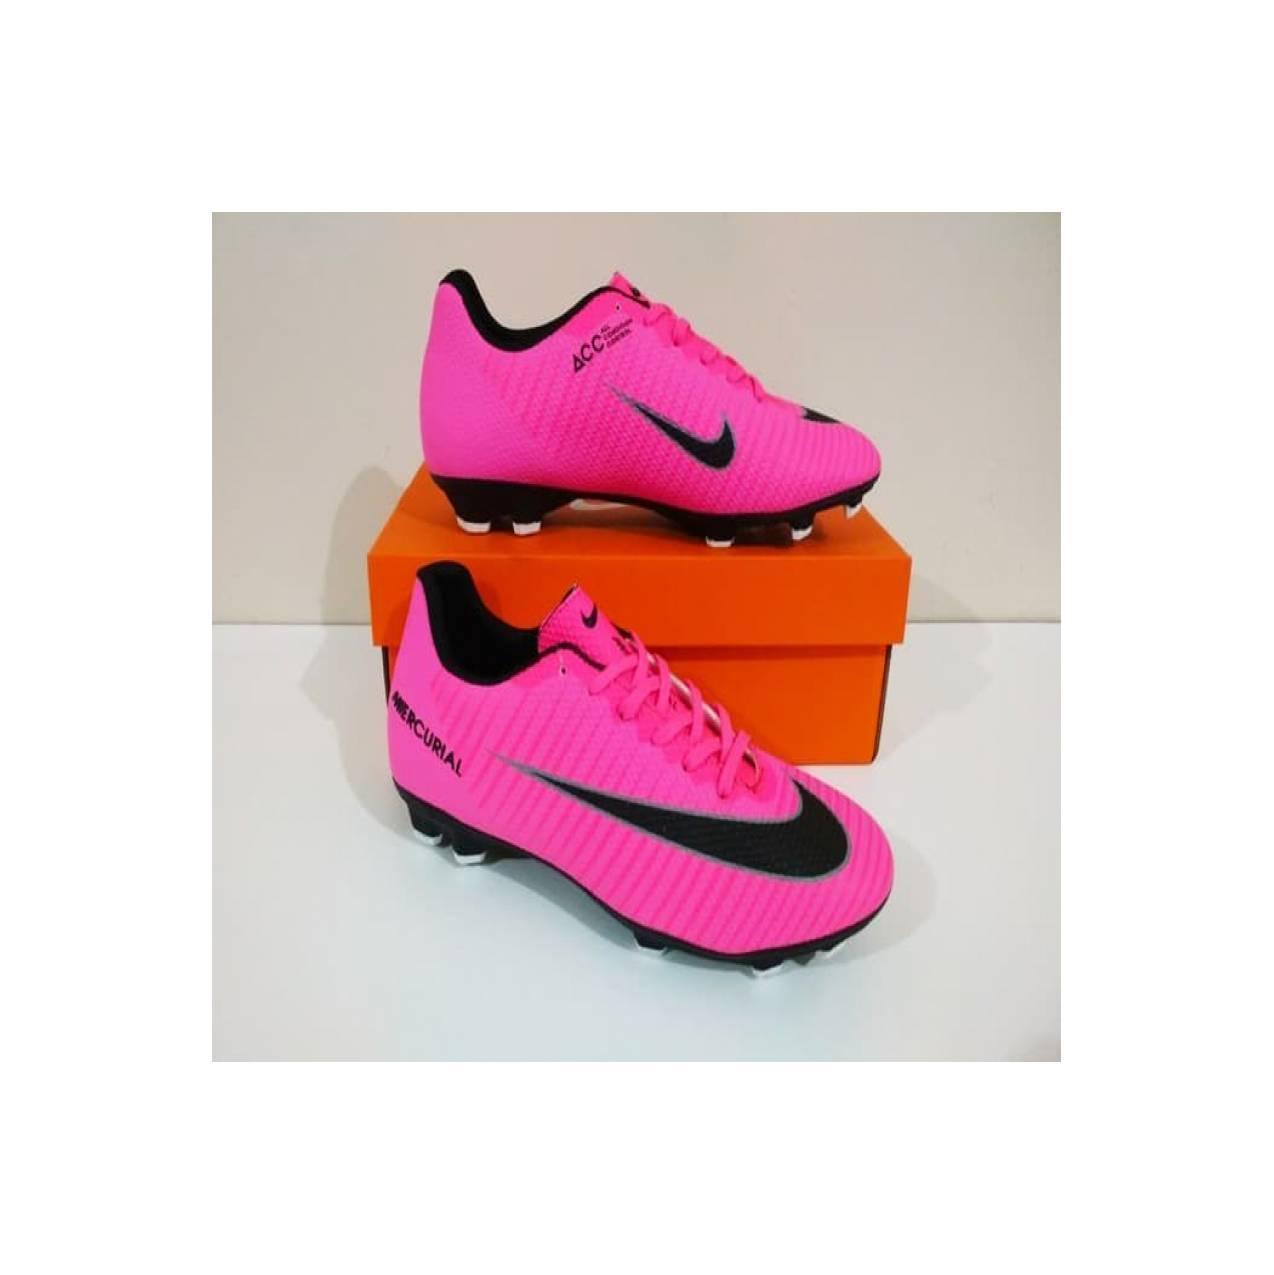 Sepatu Bola Nike Mercurial Veloce FG (Pink Black) Sepatu Nike Terbaru